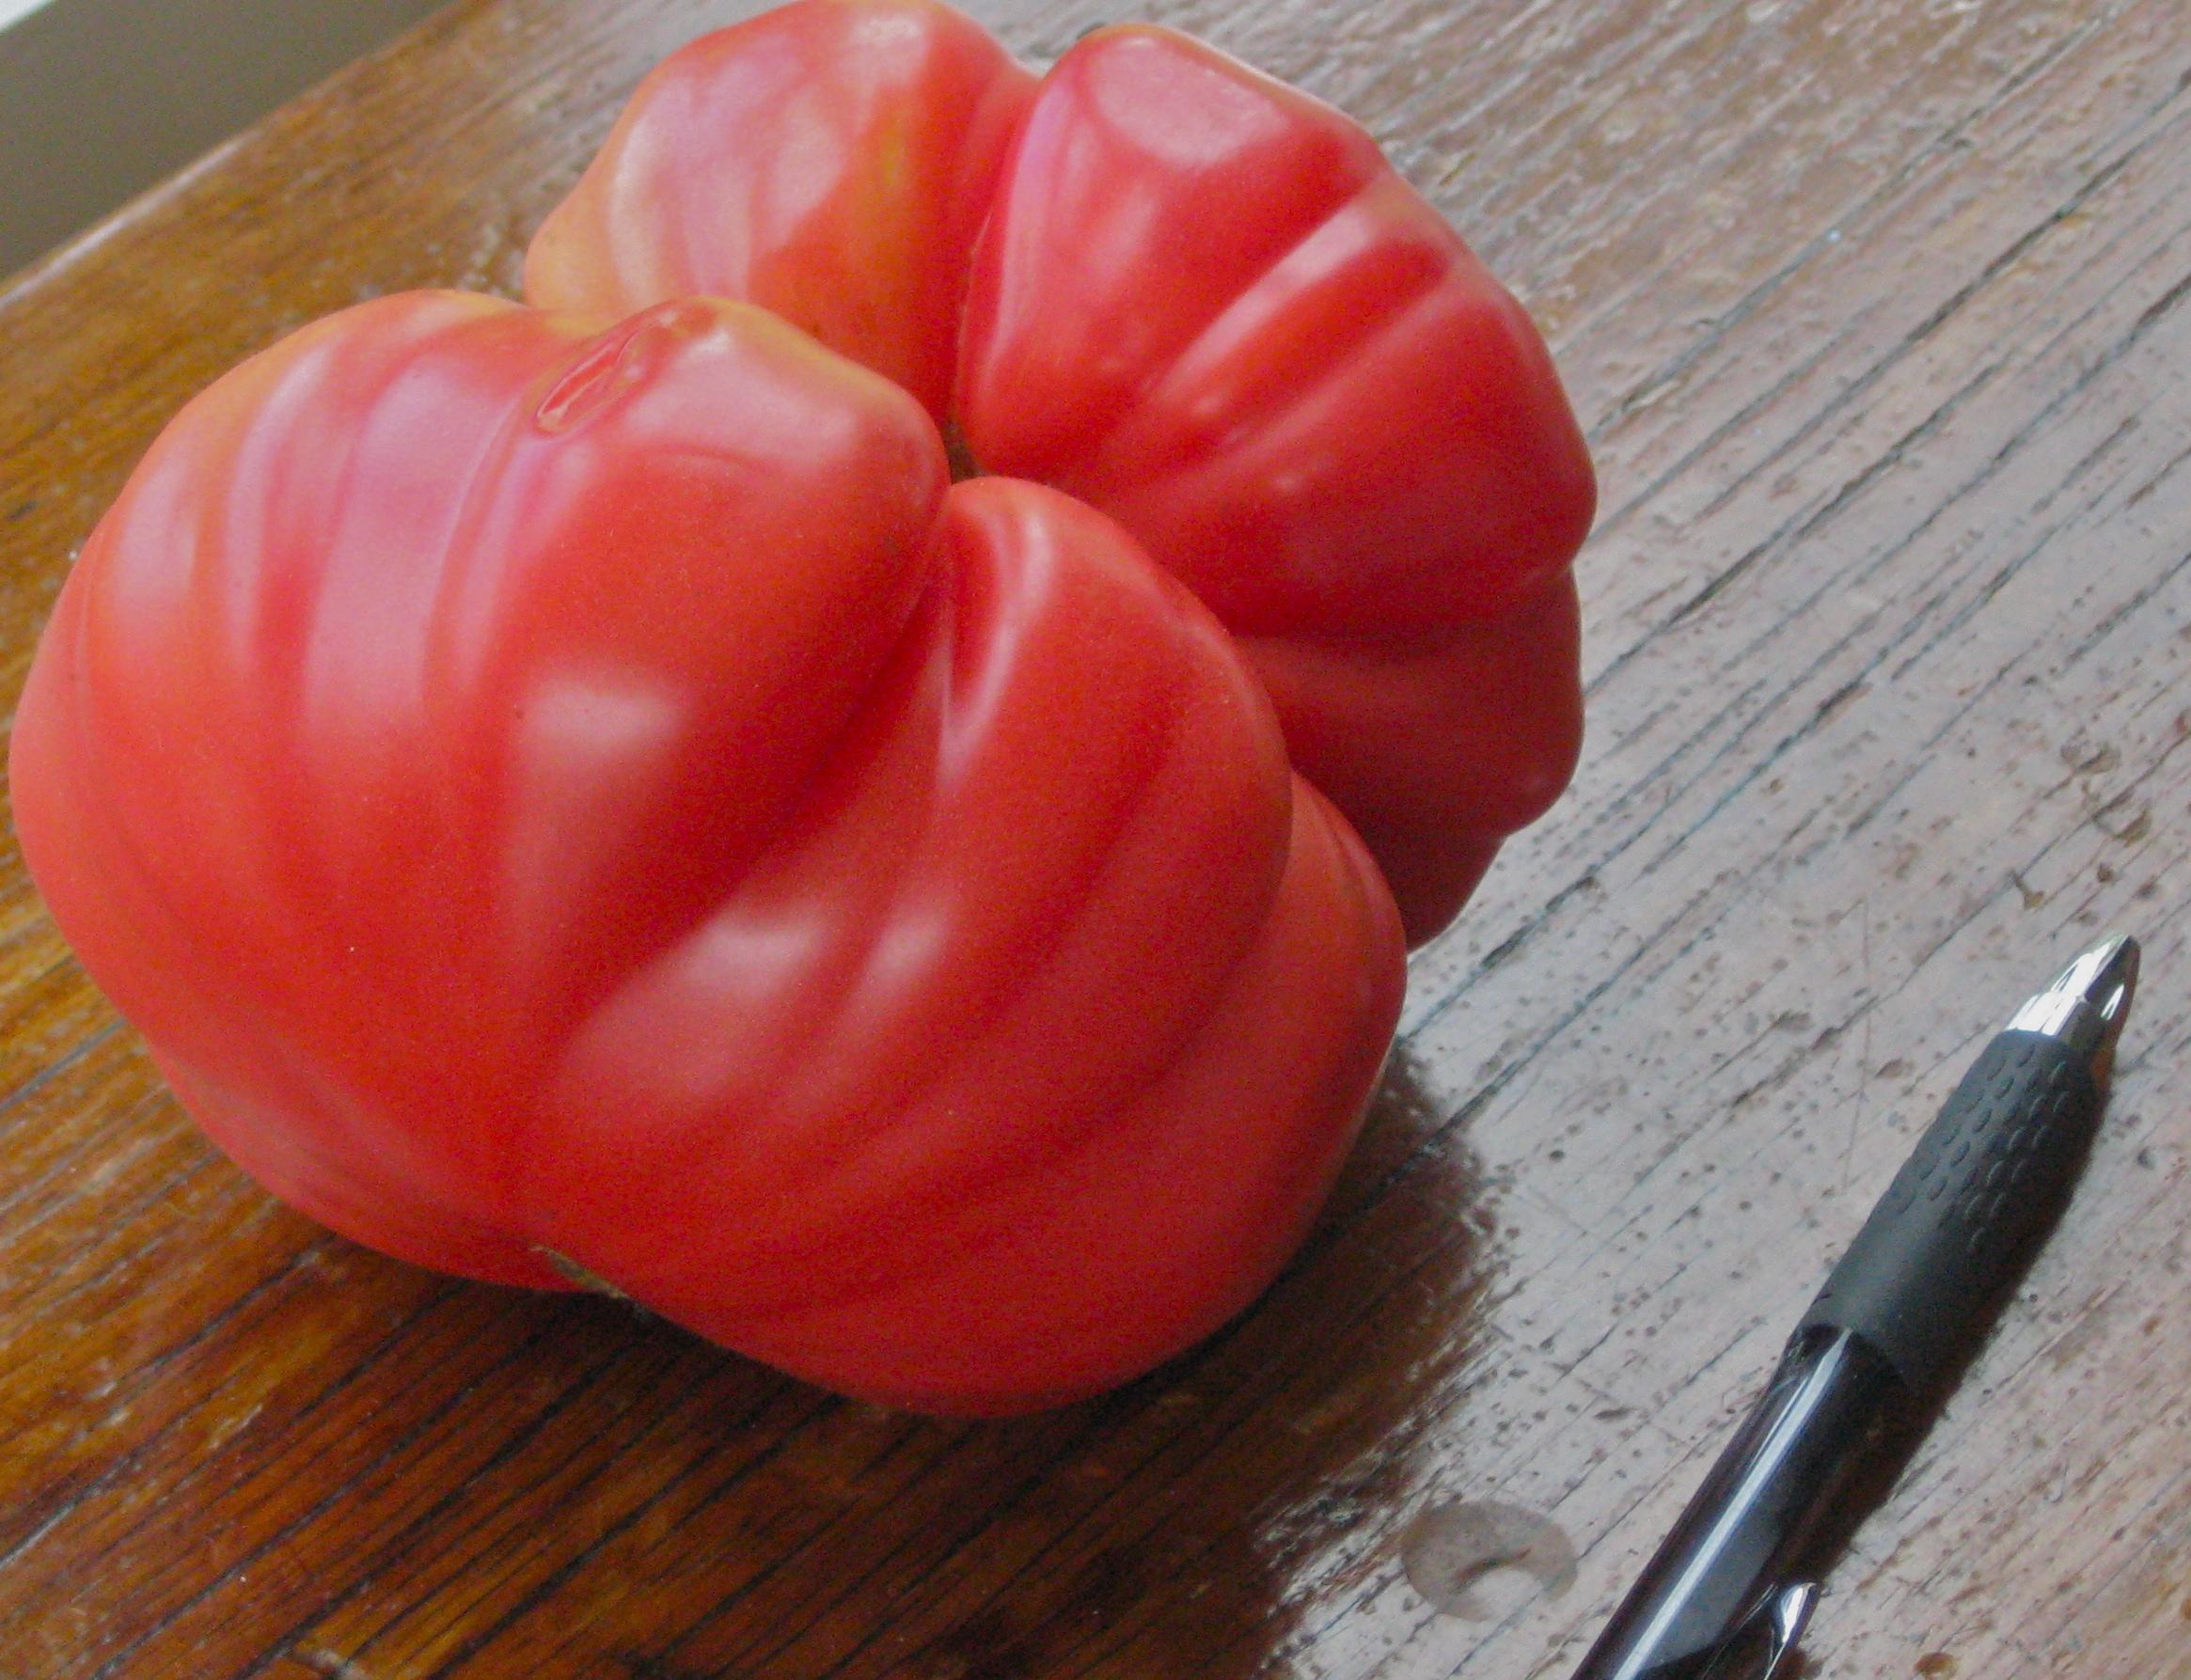 Tomato Hd Background